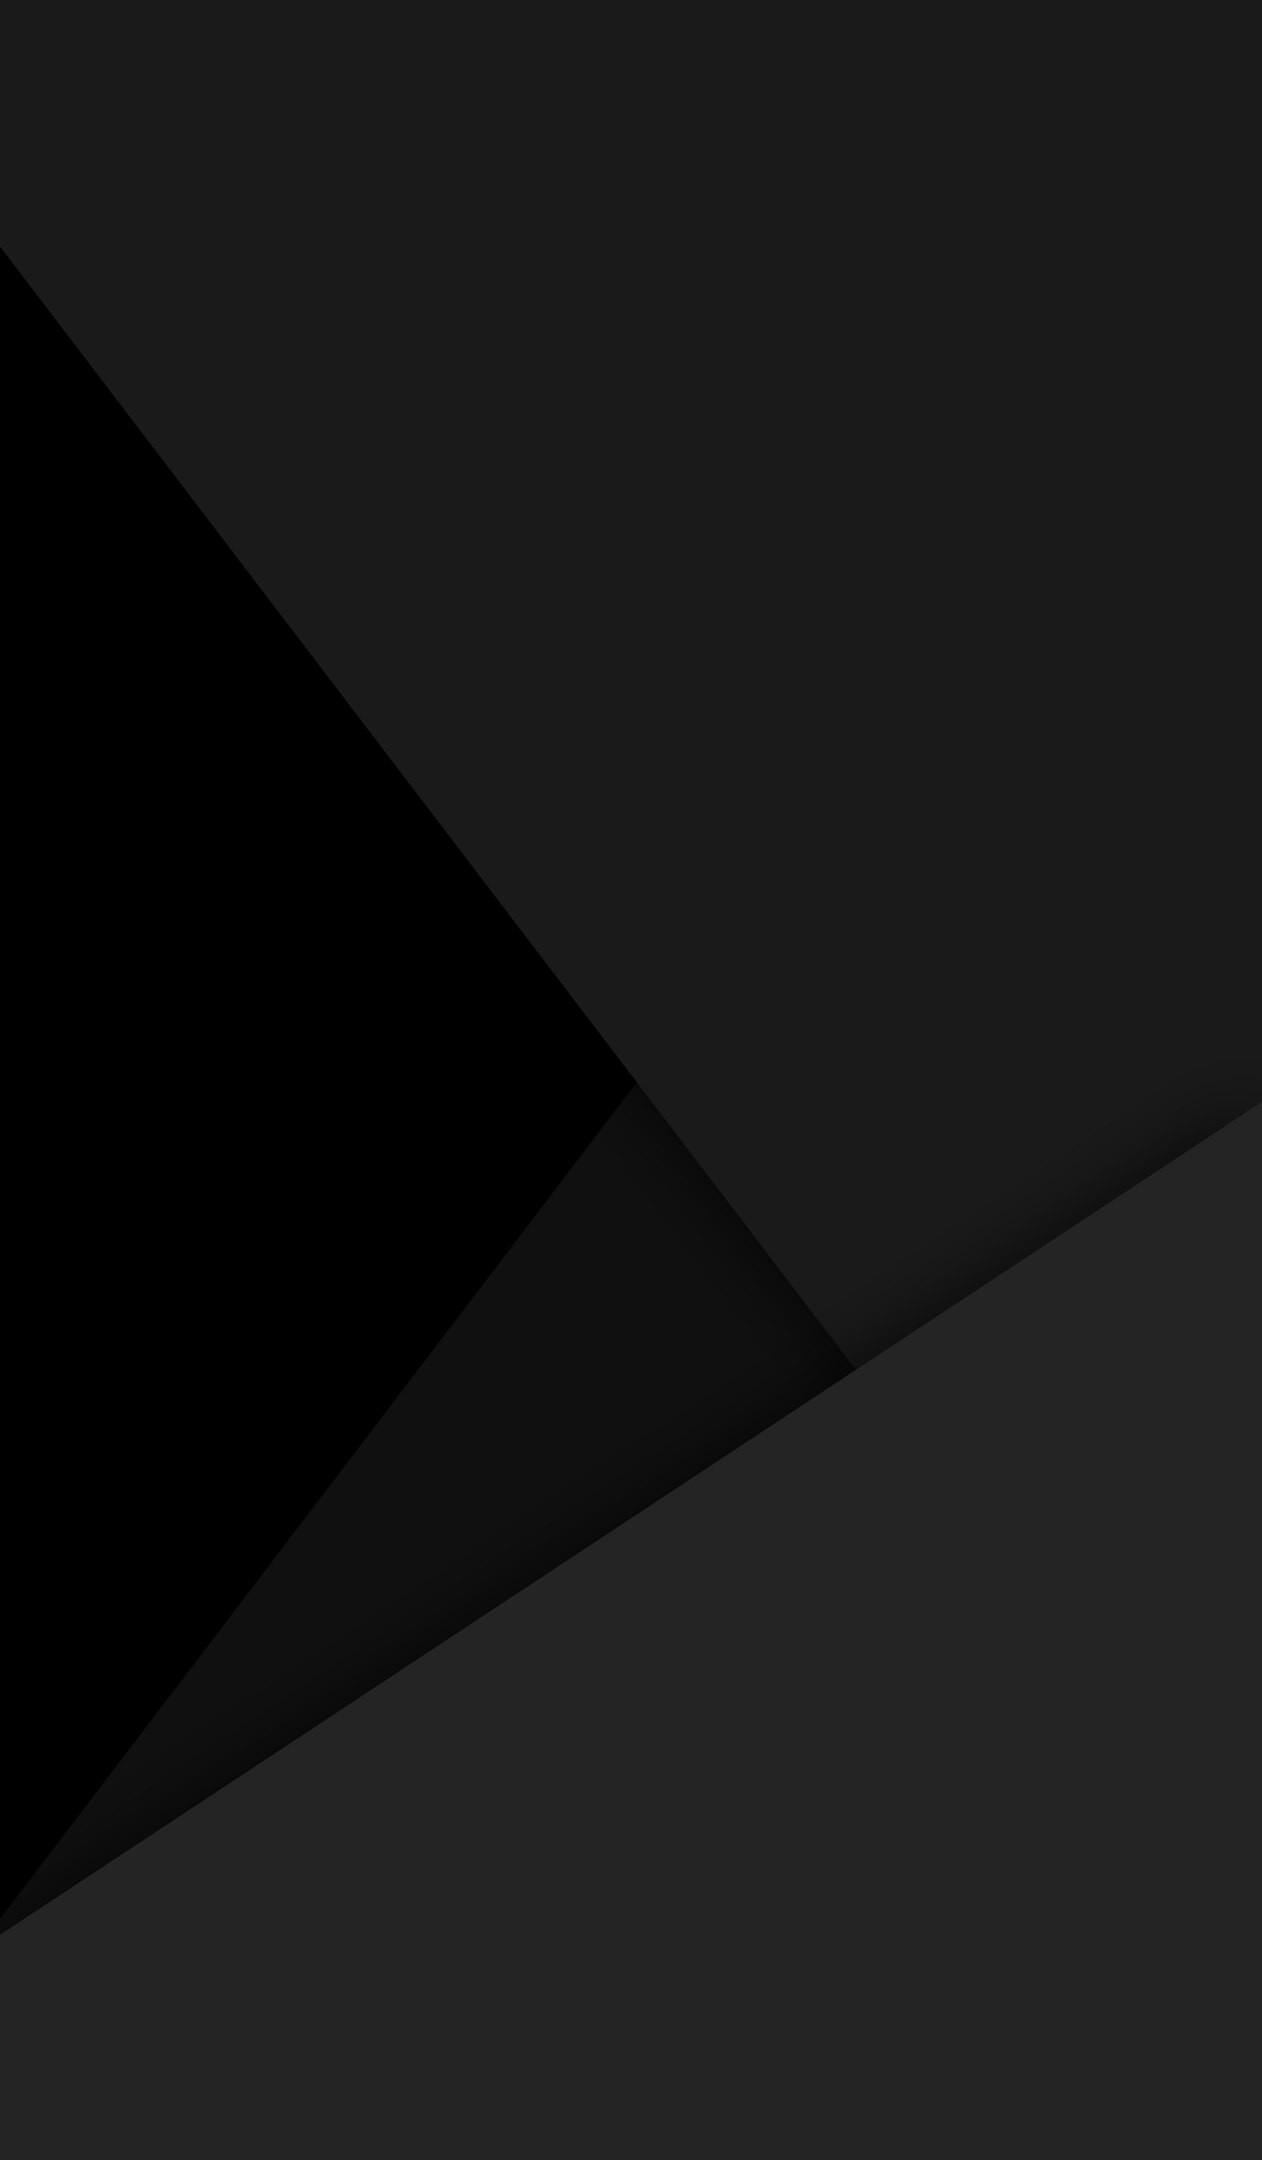 Dark Android 4k Wallpapers - Wallpaper Cave